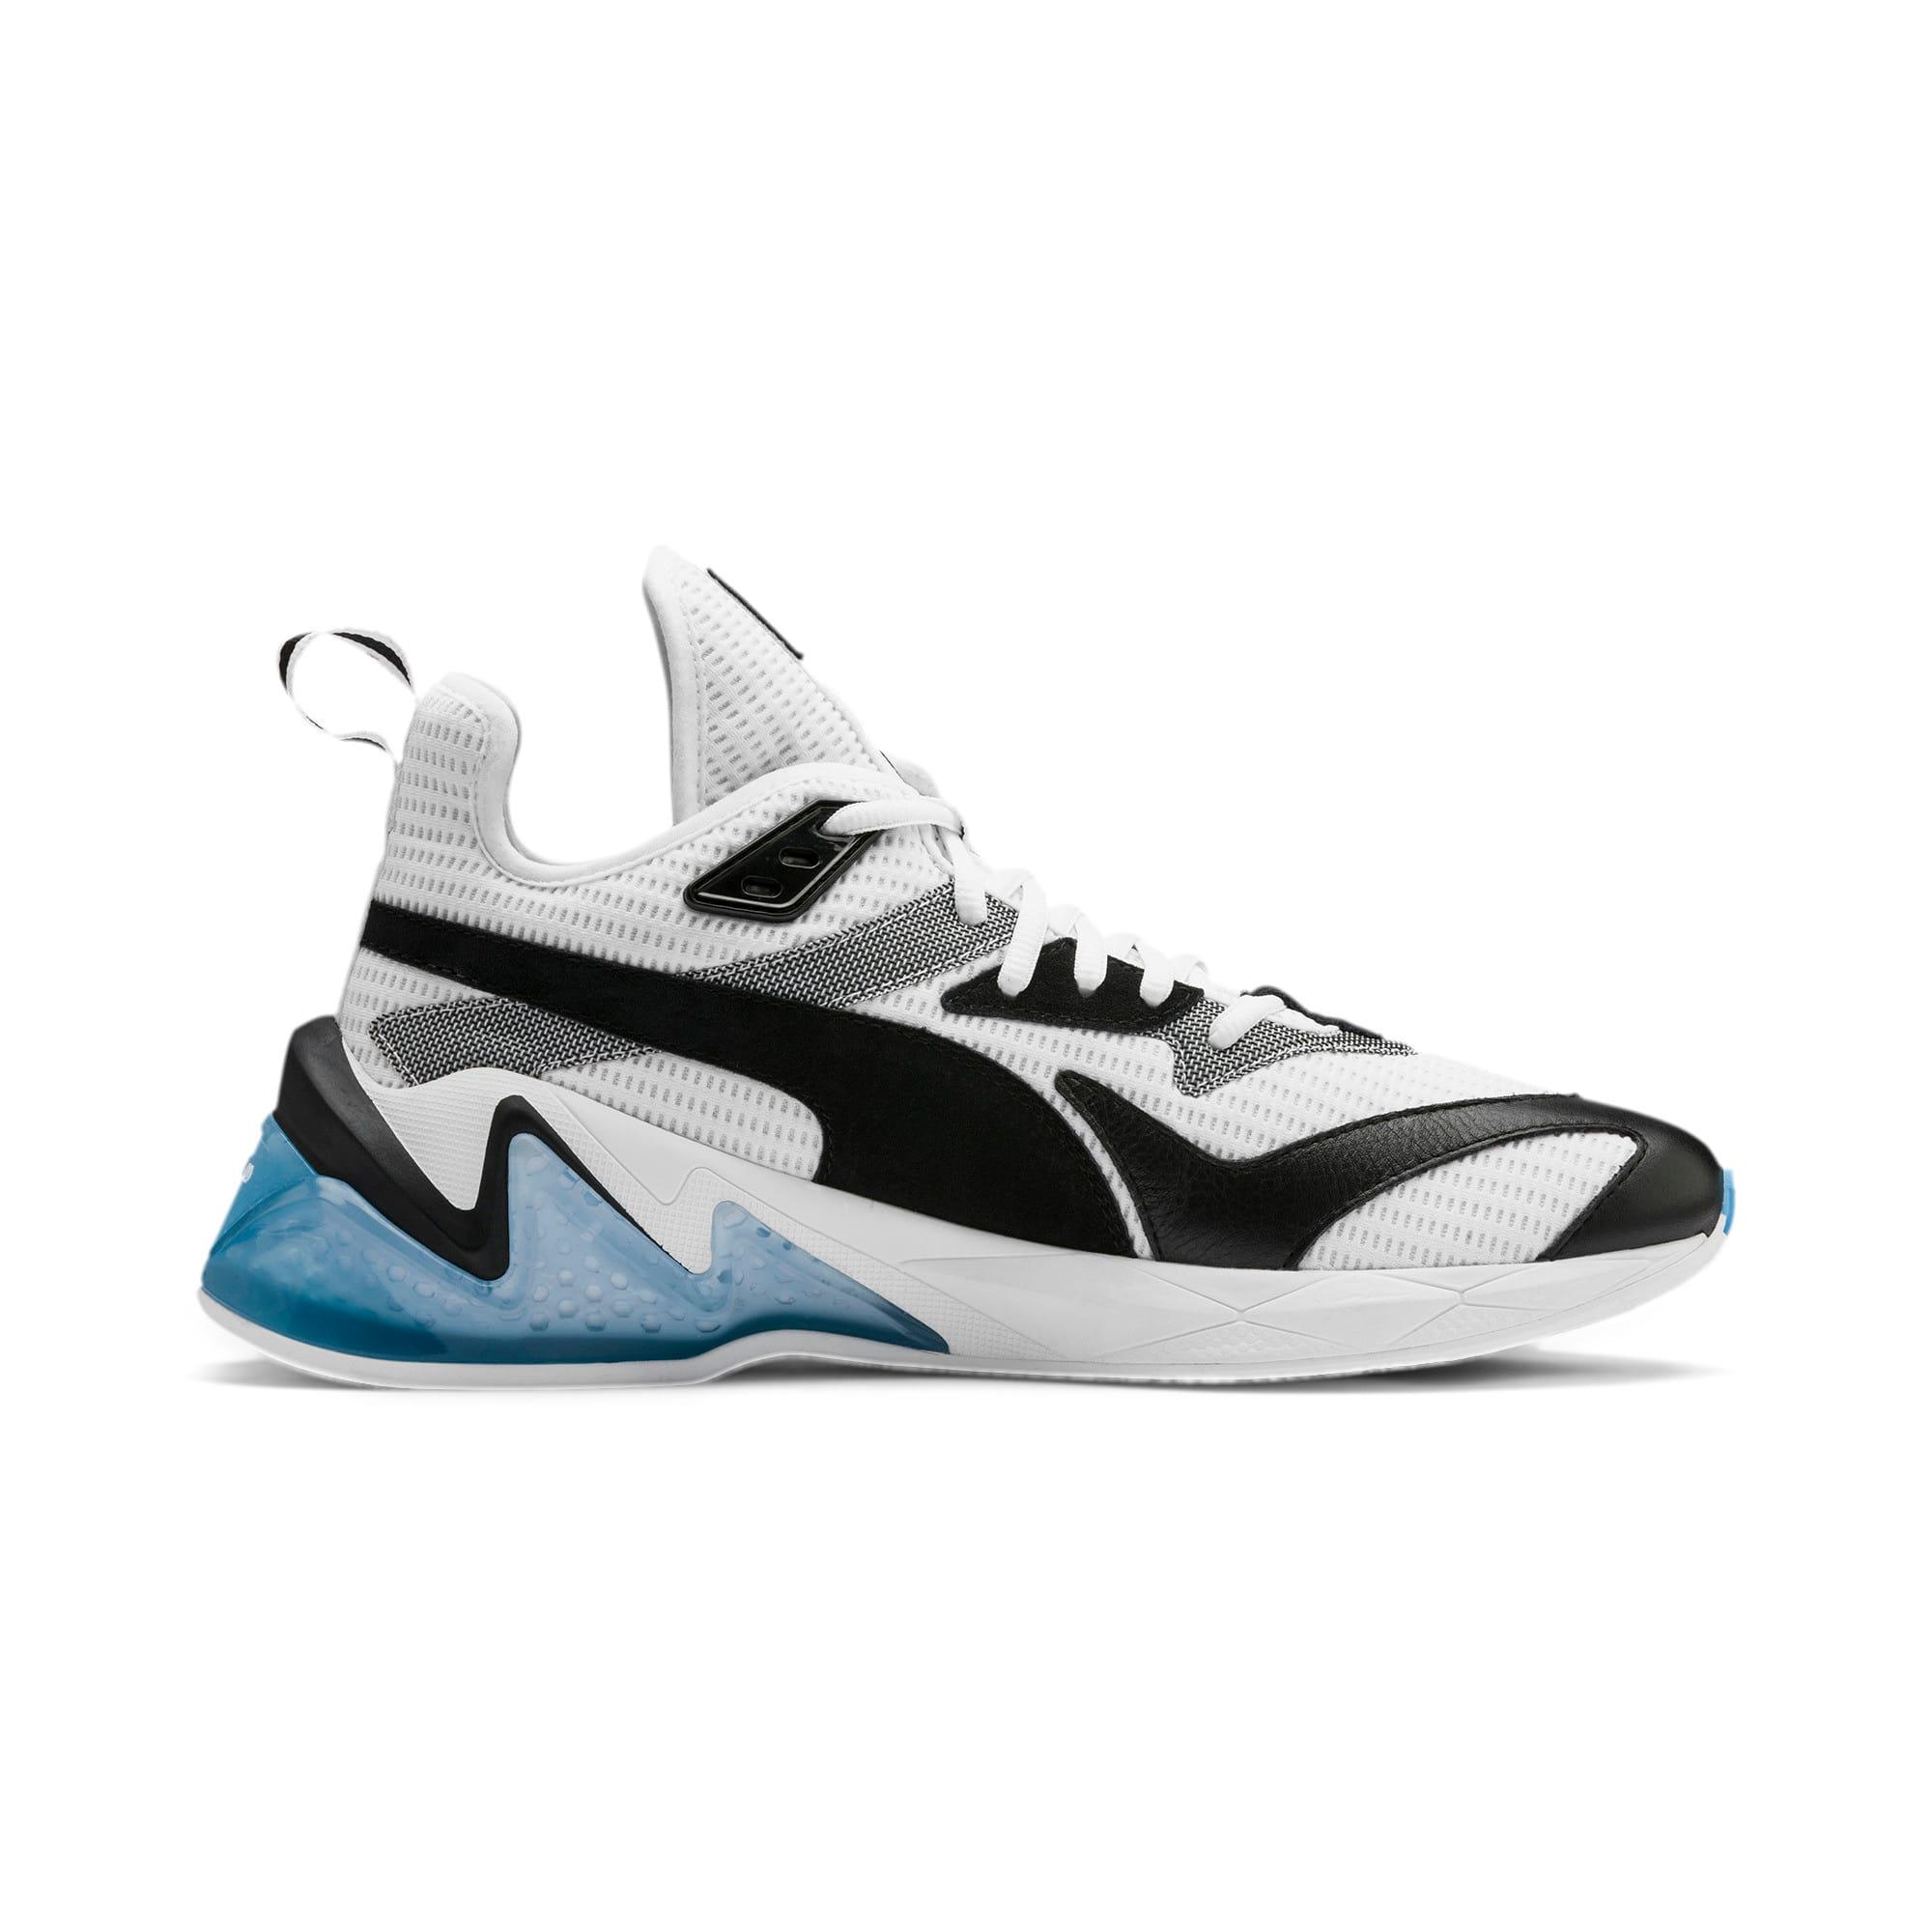 Anteprima 6 di LQDCELL Origin Men's Shoes, Puma White-Puma Black, medio